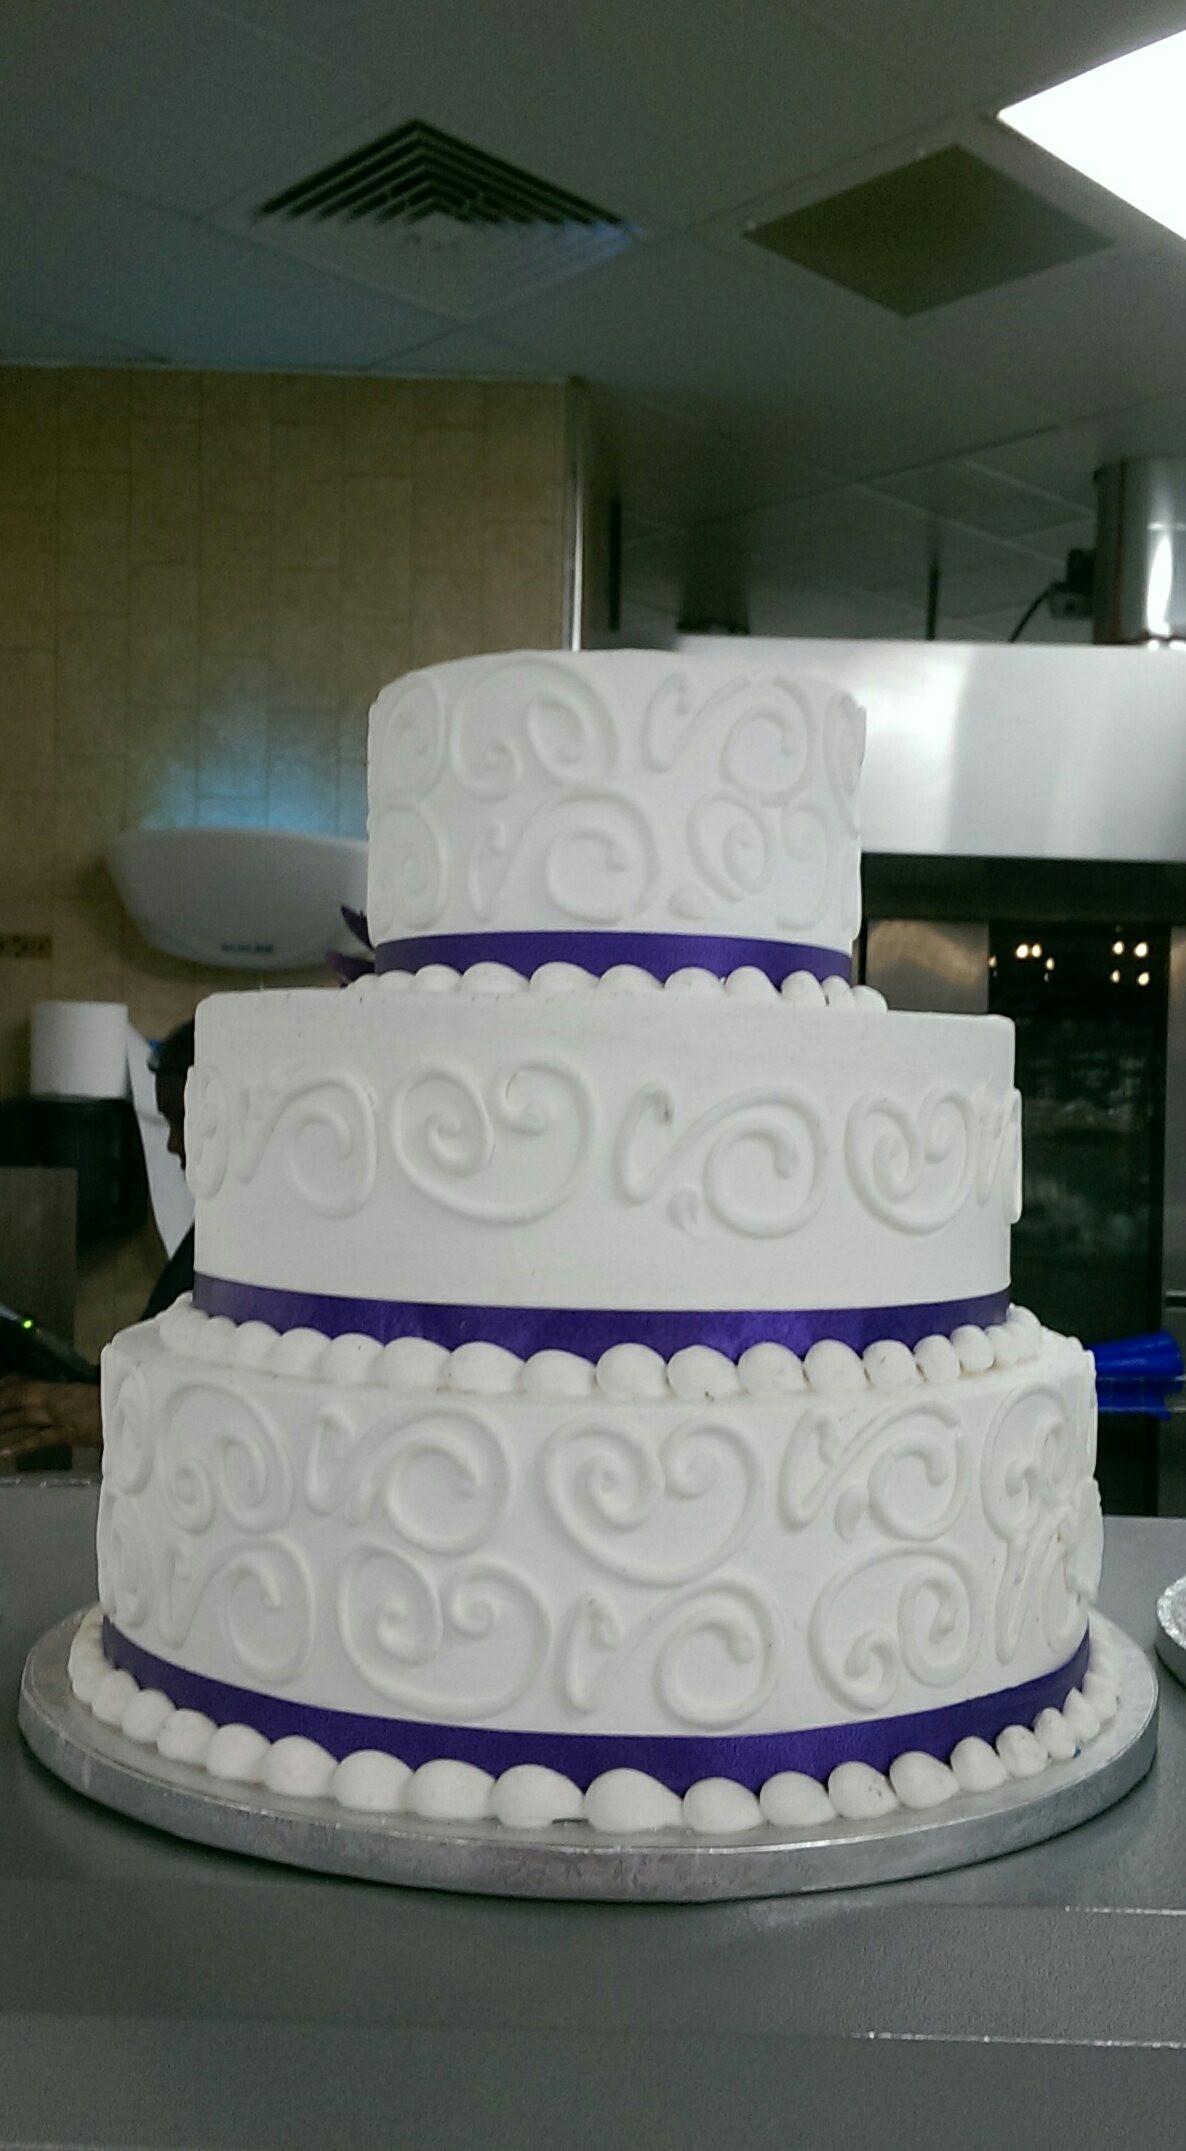 Wedding Cakes From Sam'S Club  Sam s club cake